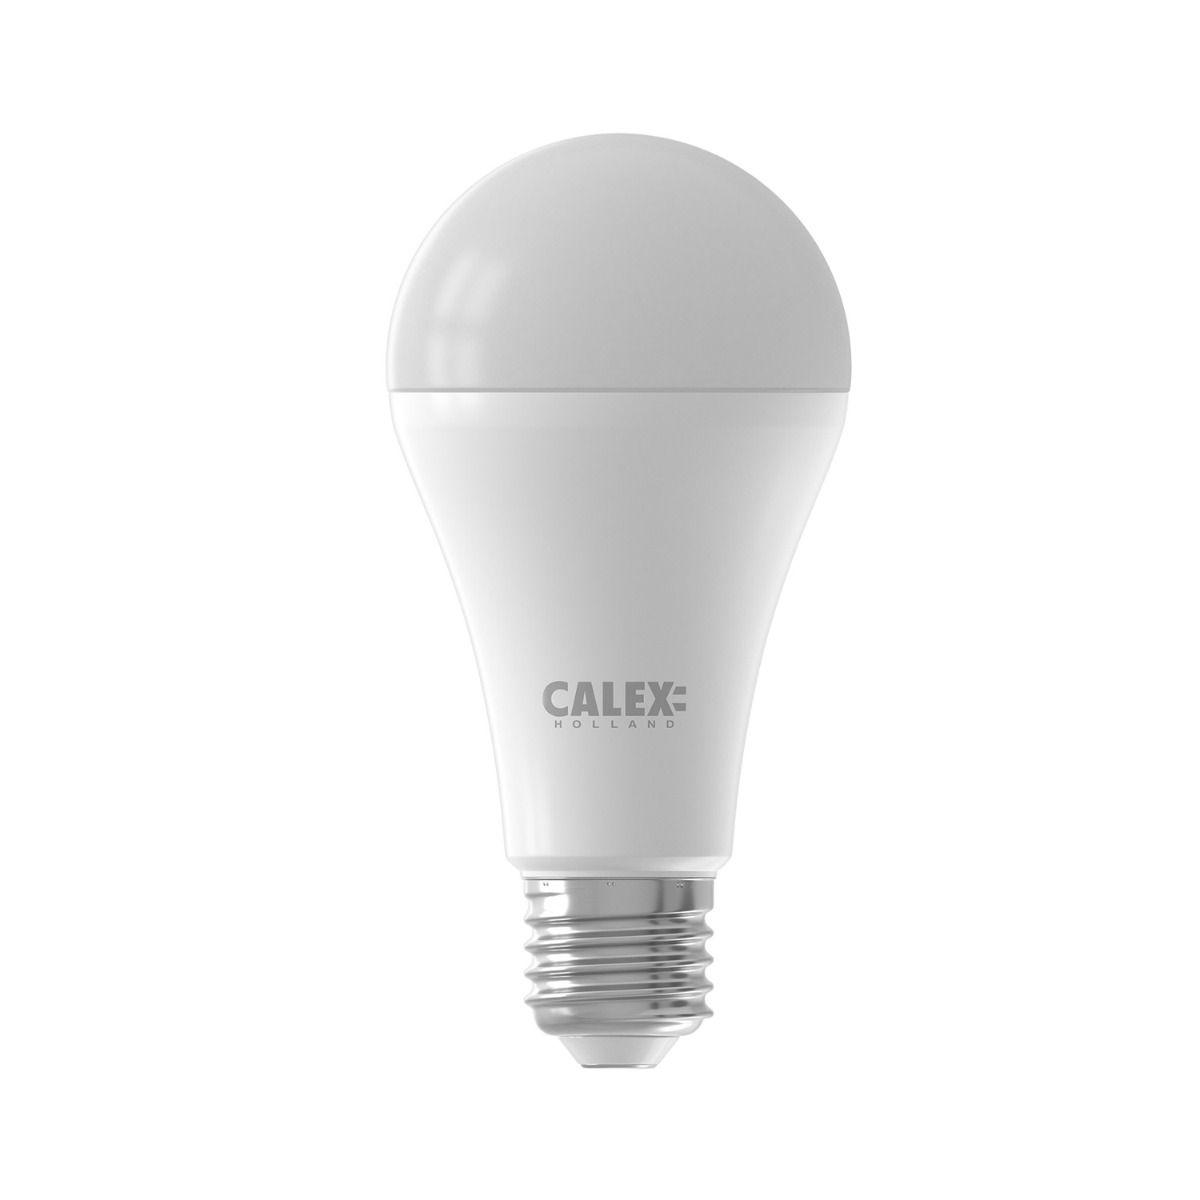 Calex Smart Standaard LED Lamp E27 14W 1400lm 2200-4000K   Tuya Wifi - Afstembaar Wit